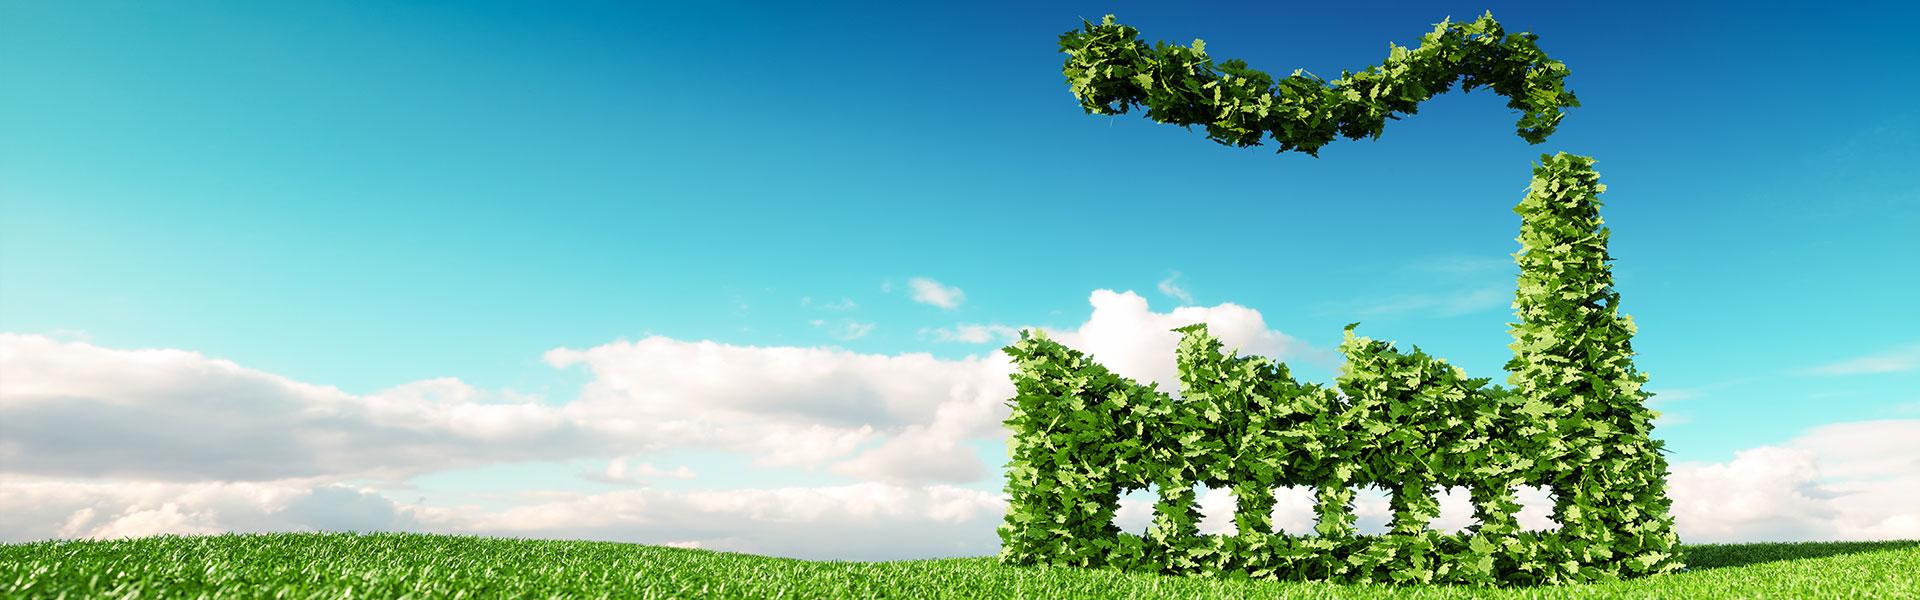 banner-environmental-policy-47-5c2aeec236e0afb9b30fc568fd26fc5c.jpg